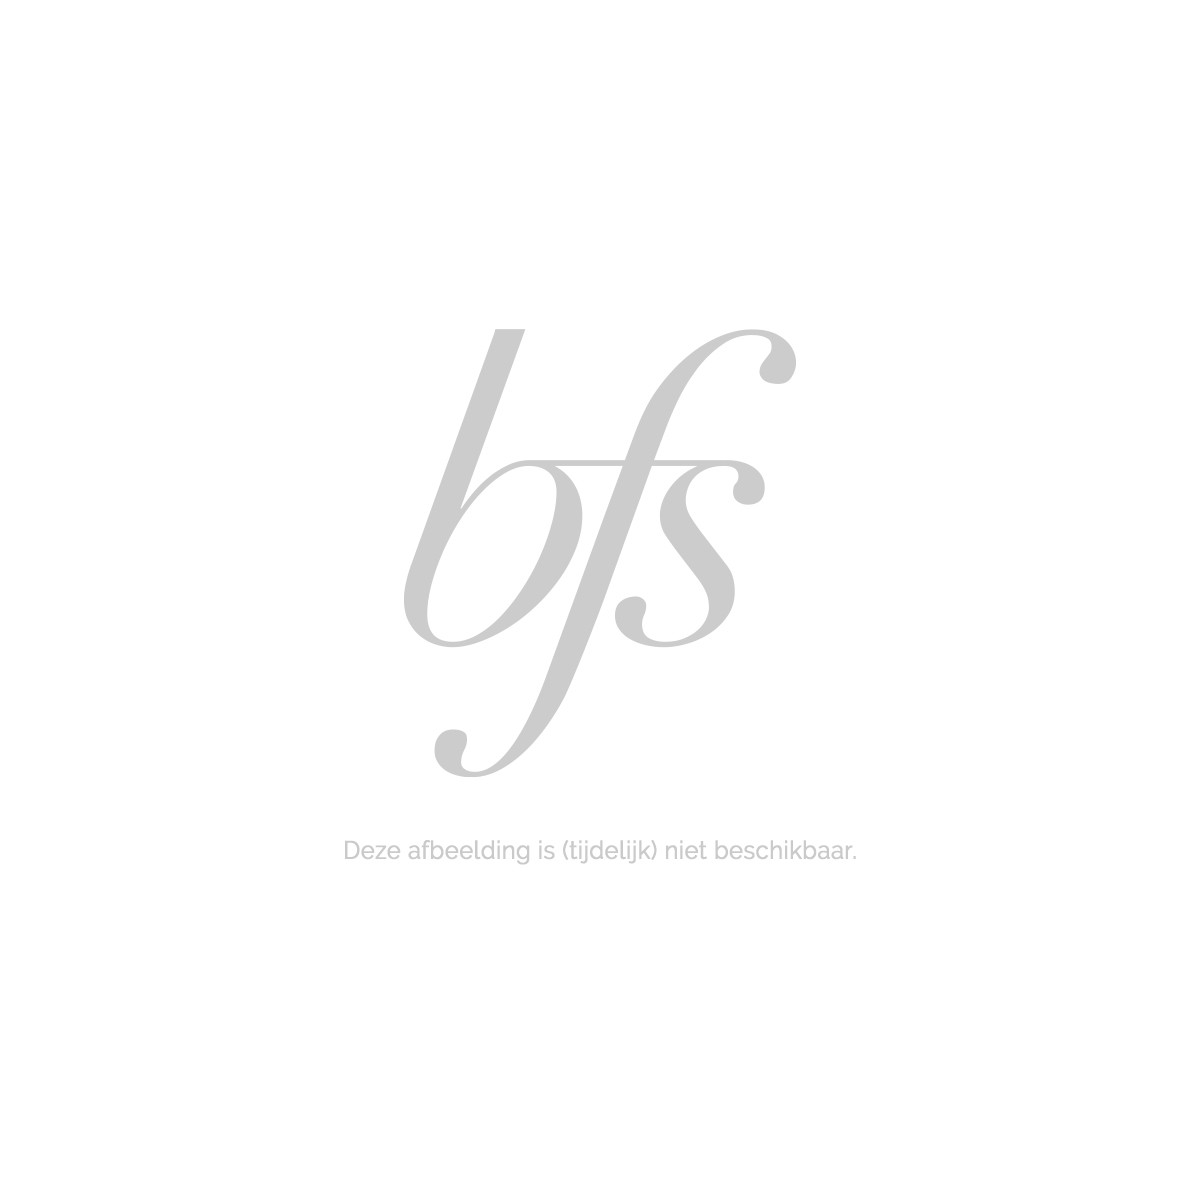 Alessandro Nsm Professional Manicure File 180/180 1 Piece